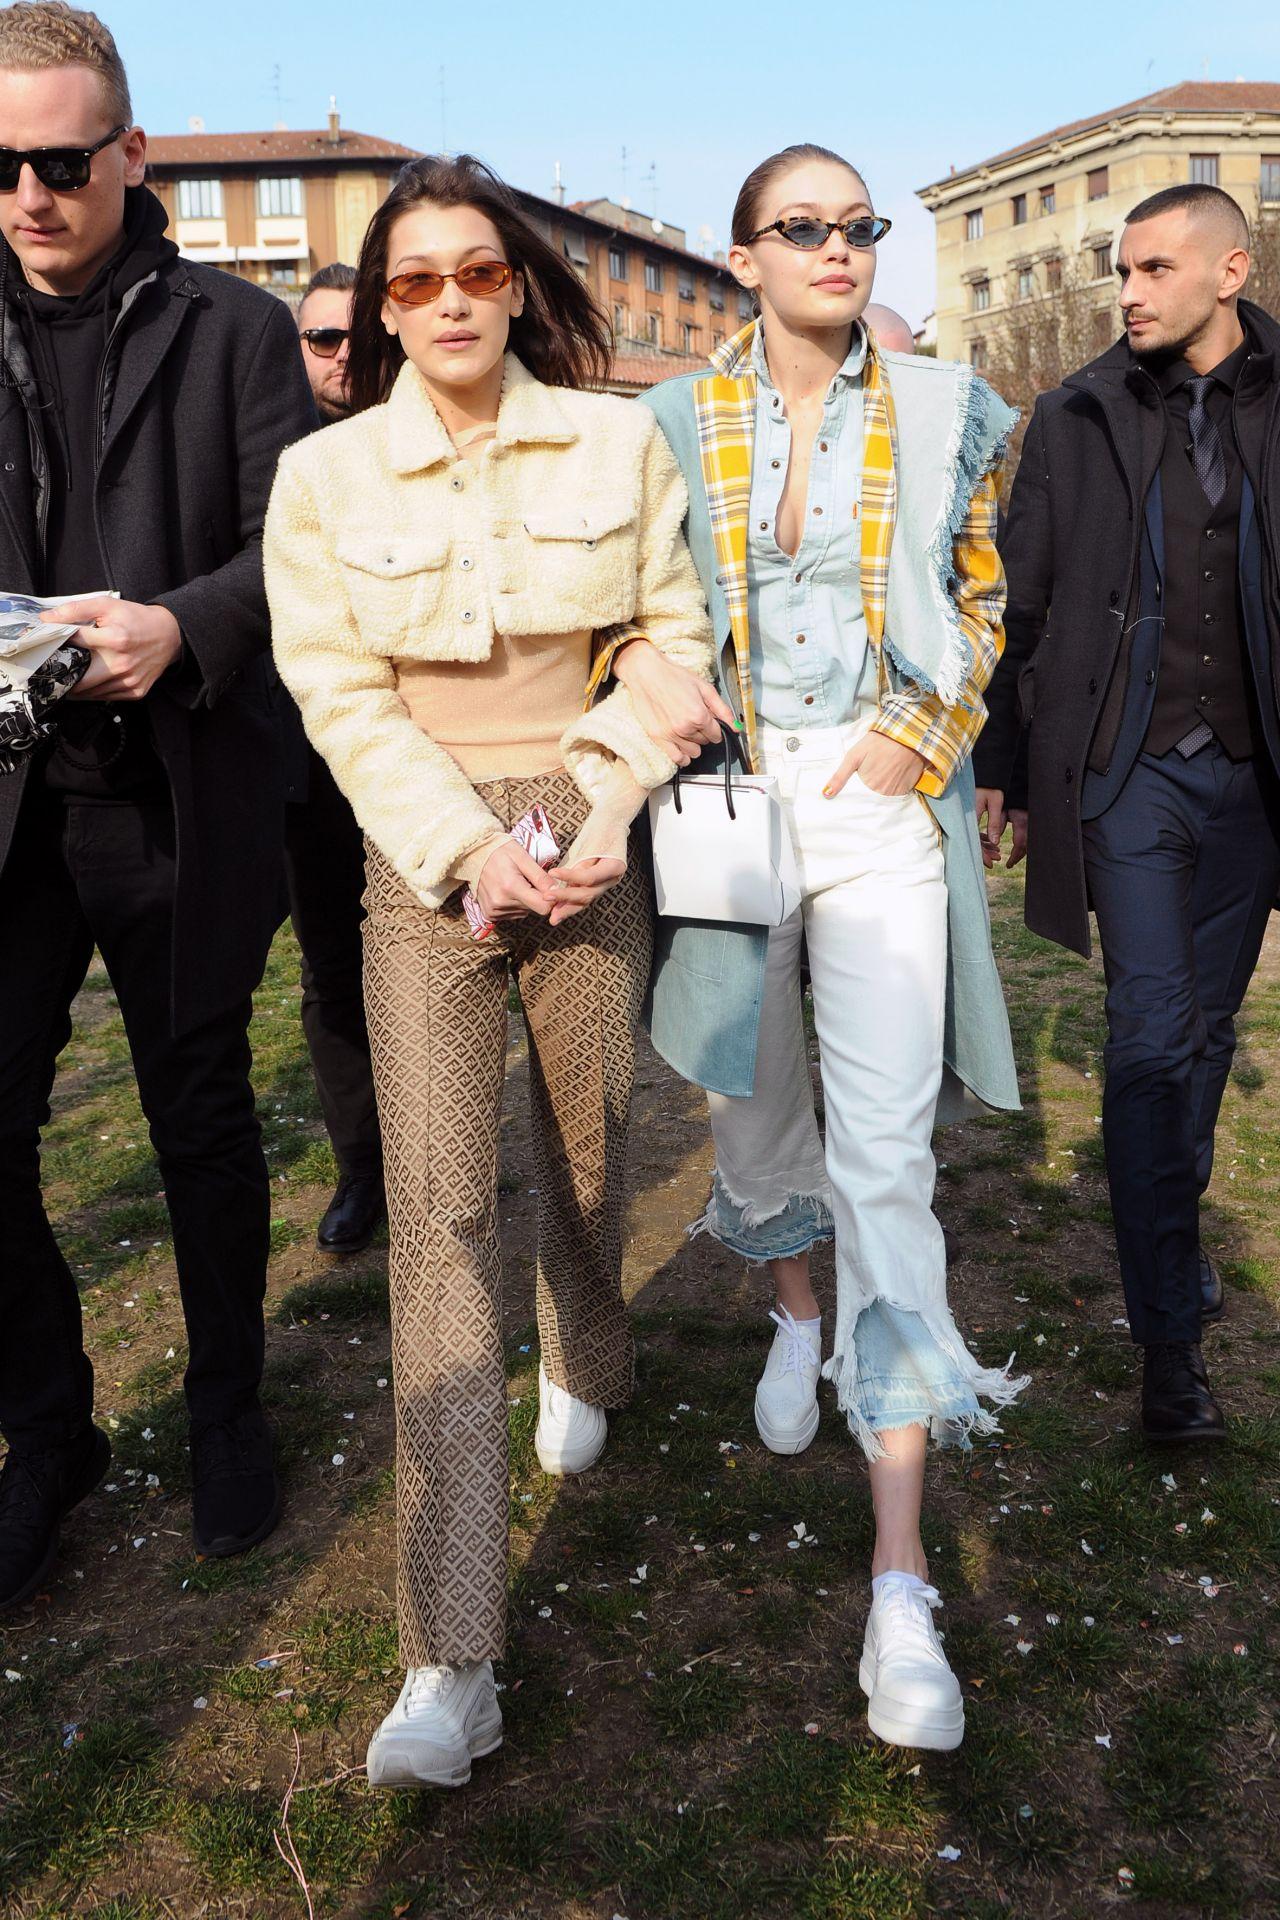 21ba5b0ff0d7 Bella Hadid and Gigi Hadid – Leaving the Moschino Fitting in Preperation  for Milan Fashion Week 02 21 2018